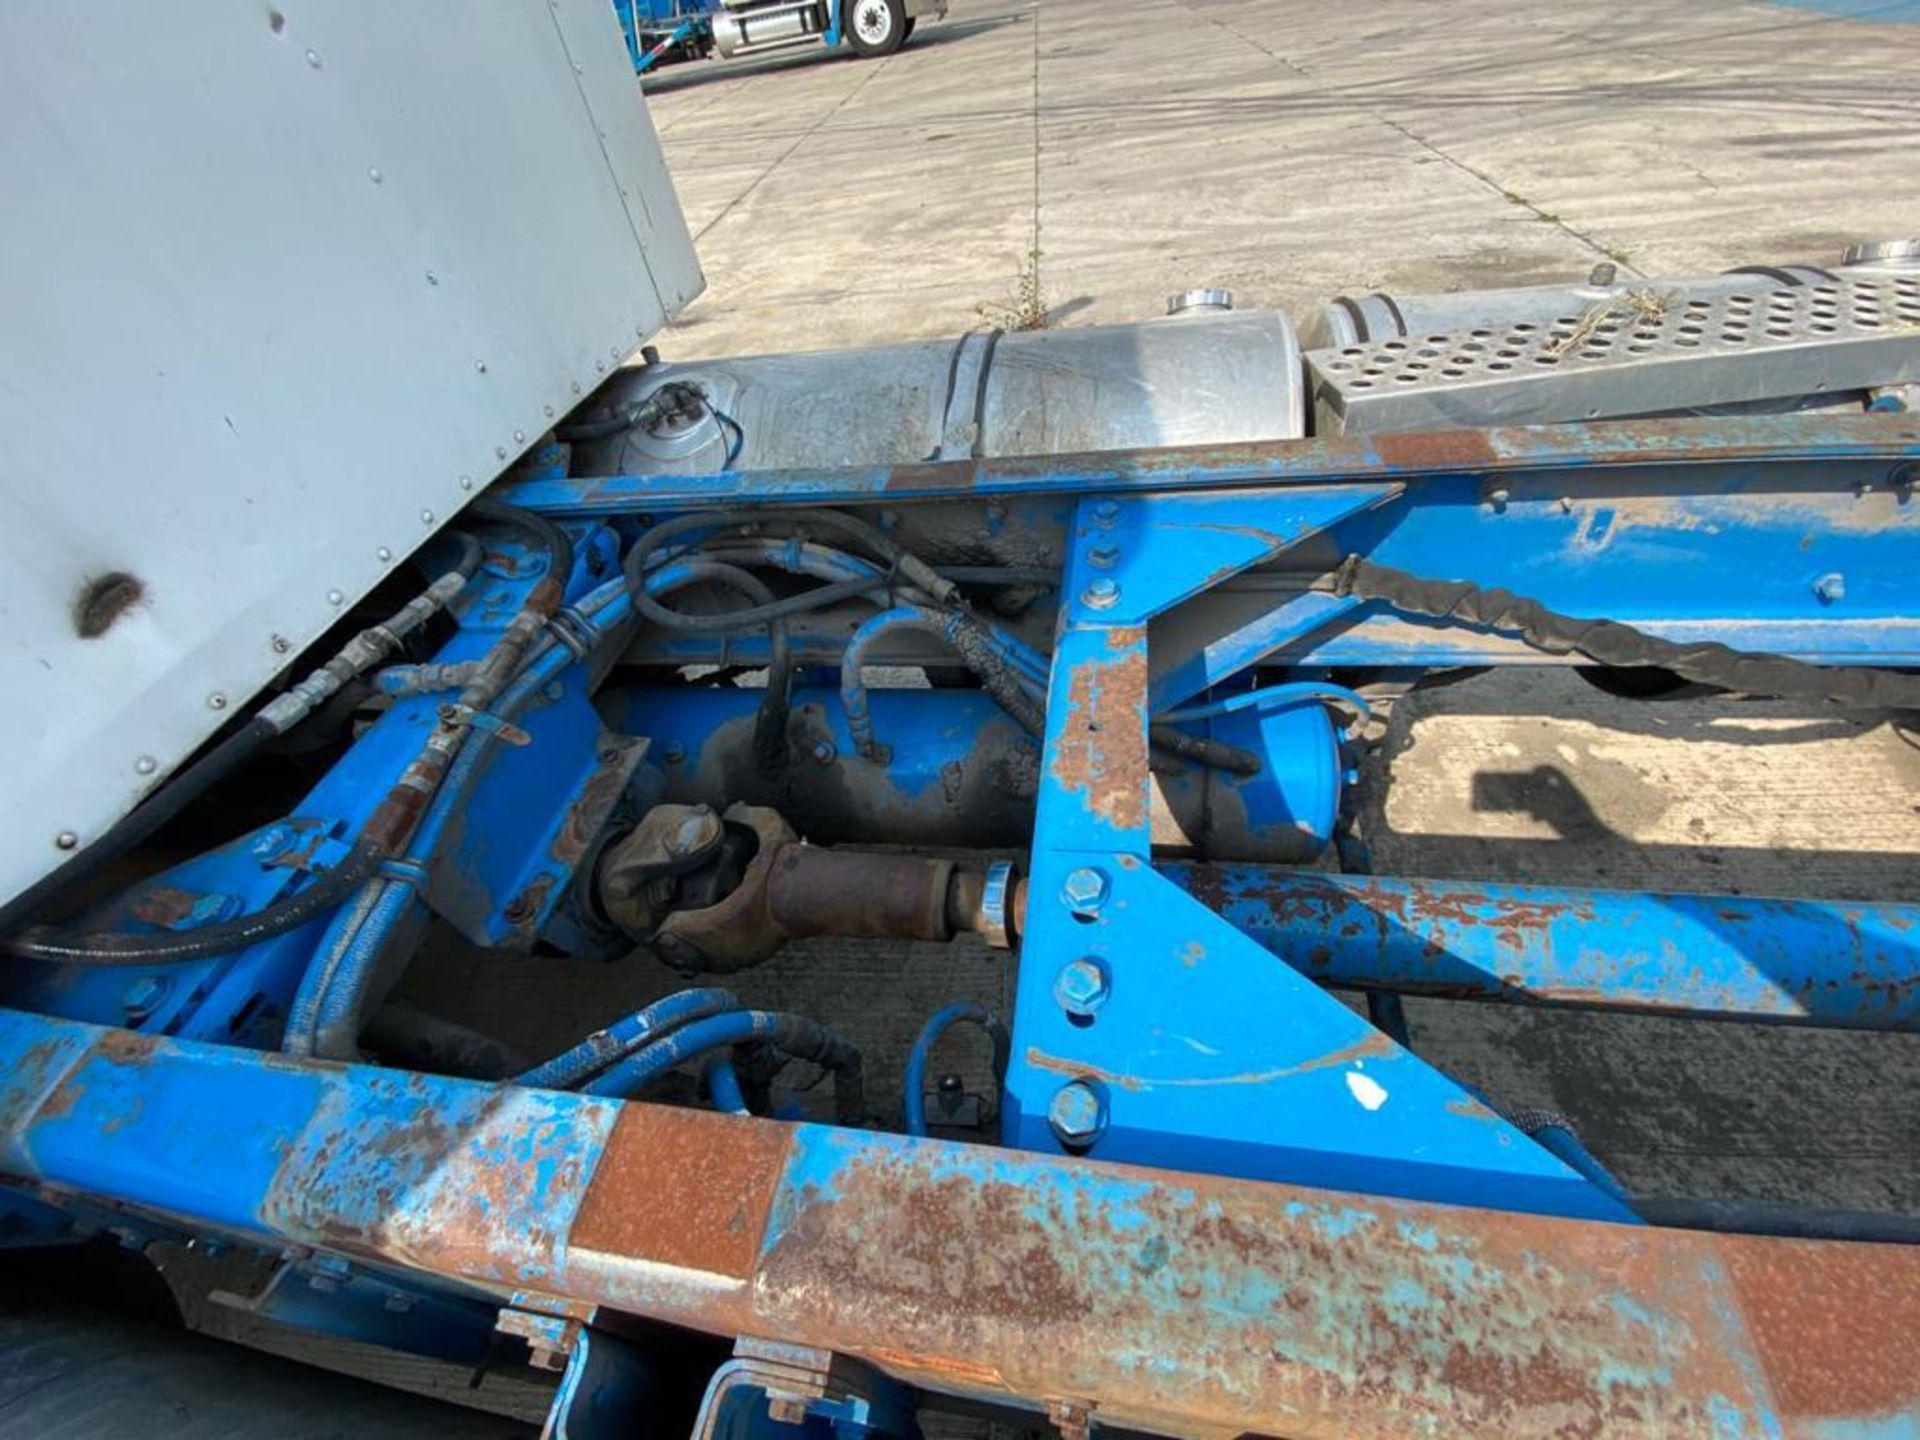 1999 Kenworth Sleeper truck tractor, standard transmission of 18 speeds - Image 15 of 75